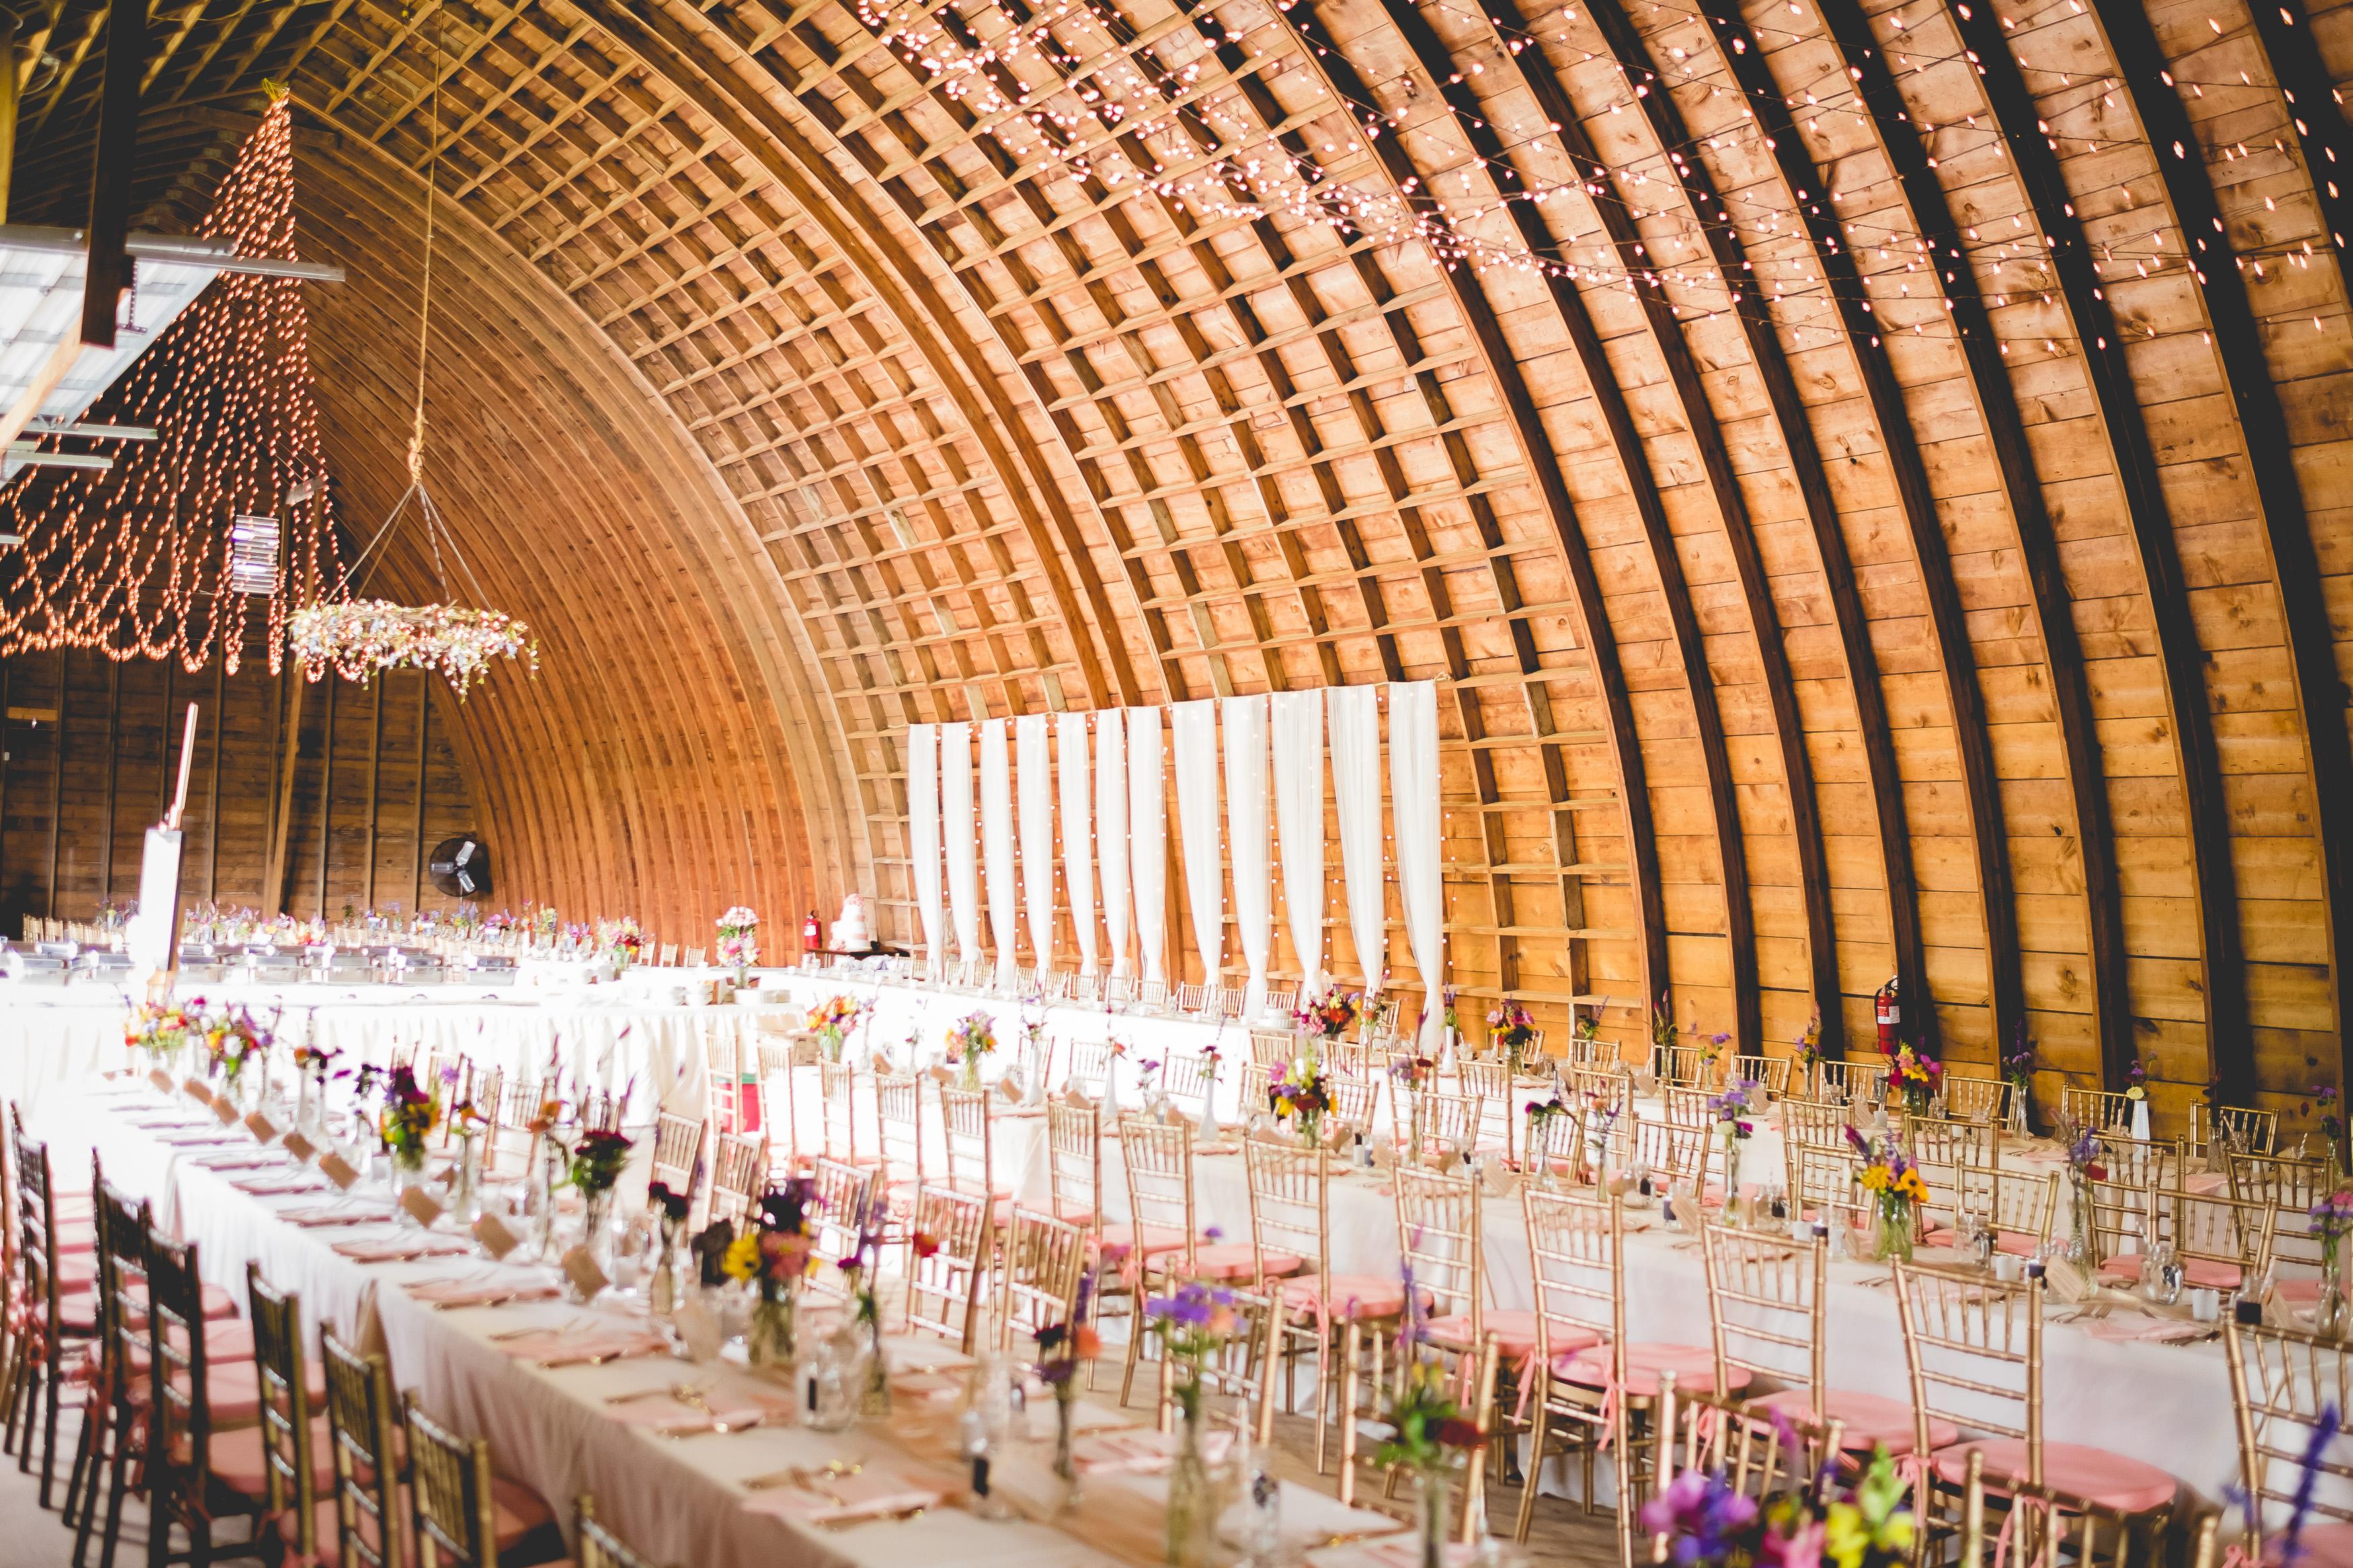 Bramblewood at Simmons Hickory Farm - McDonald PA - Rustic Wedding Guide